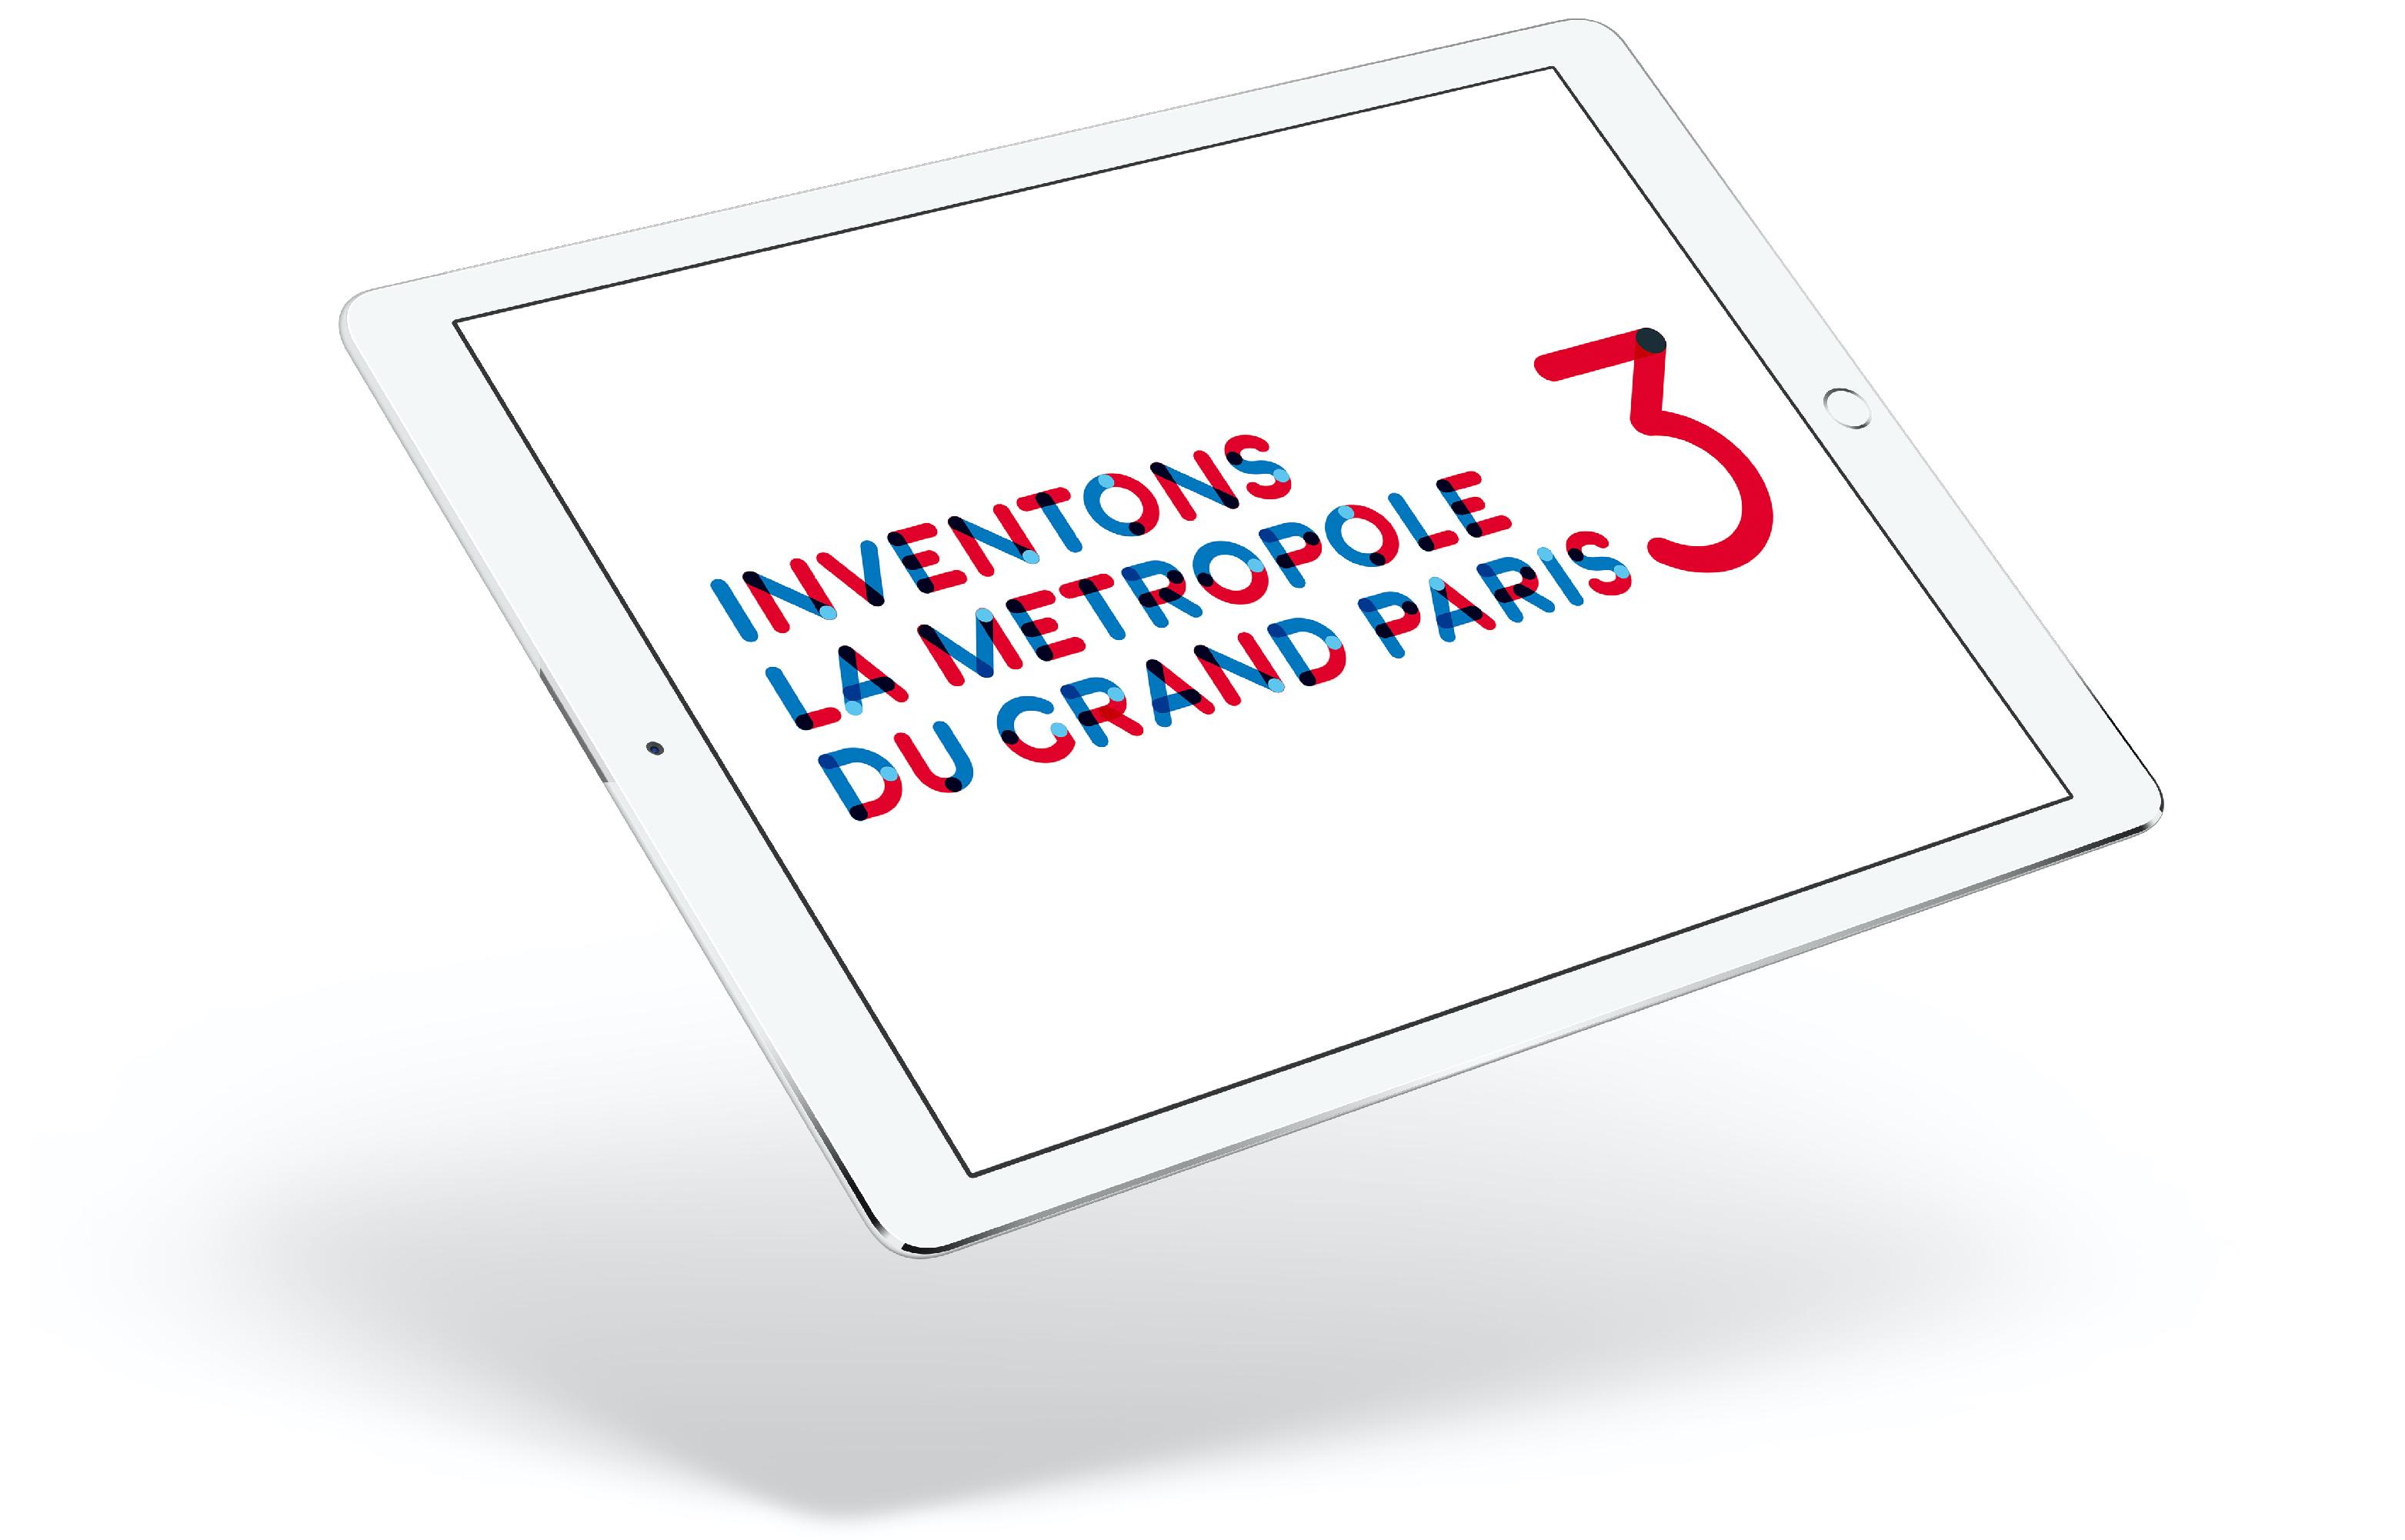 https://services.atelier-des-giboulees.com/storage/uploads/e0ad6720-704b-4369-9e64-3b3712920902/mgp-tablette-inventon-metropole-logo.jpg